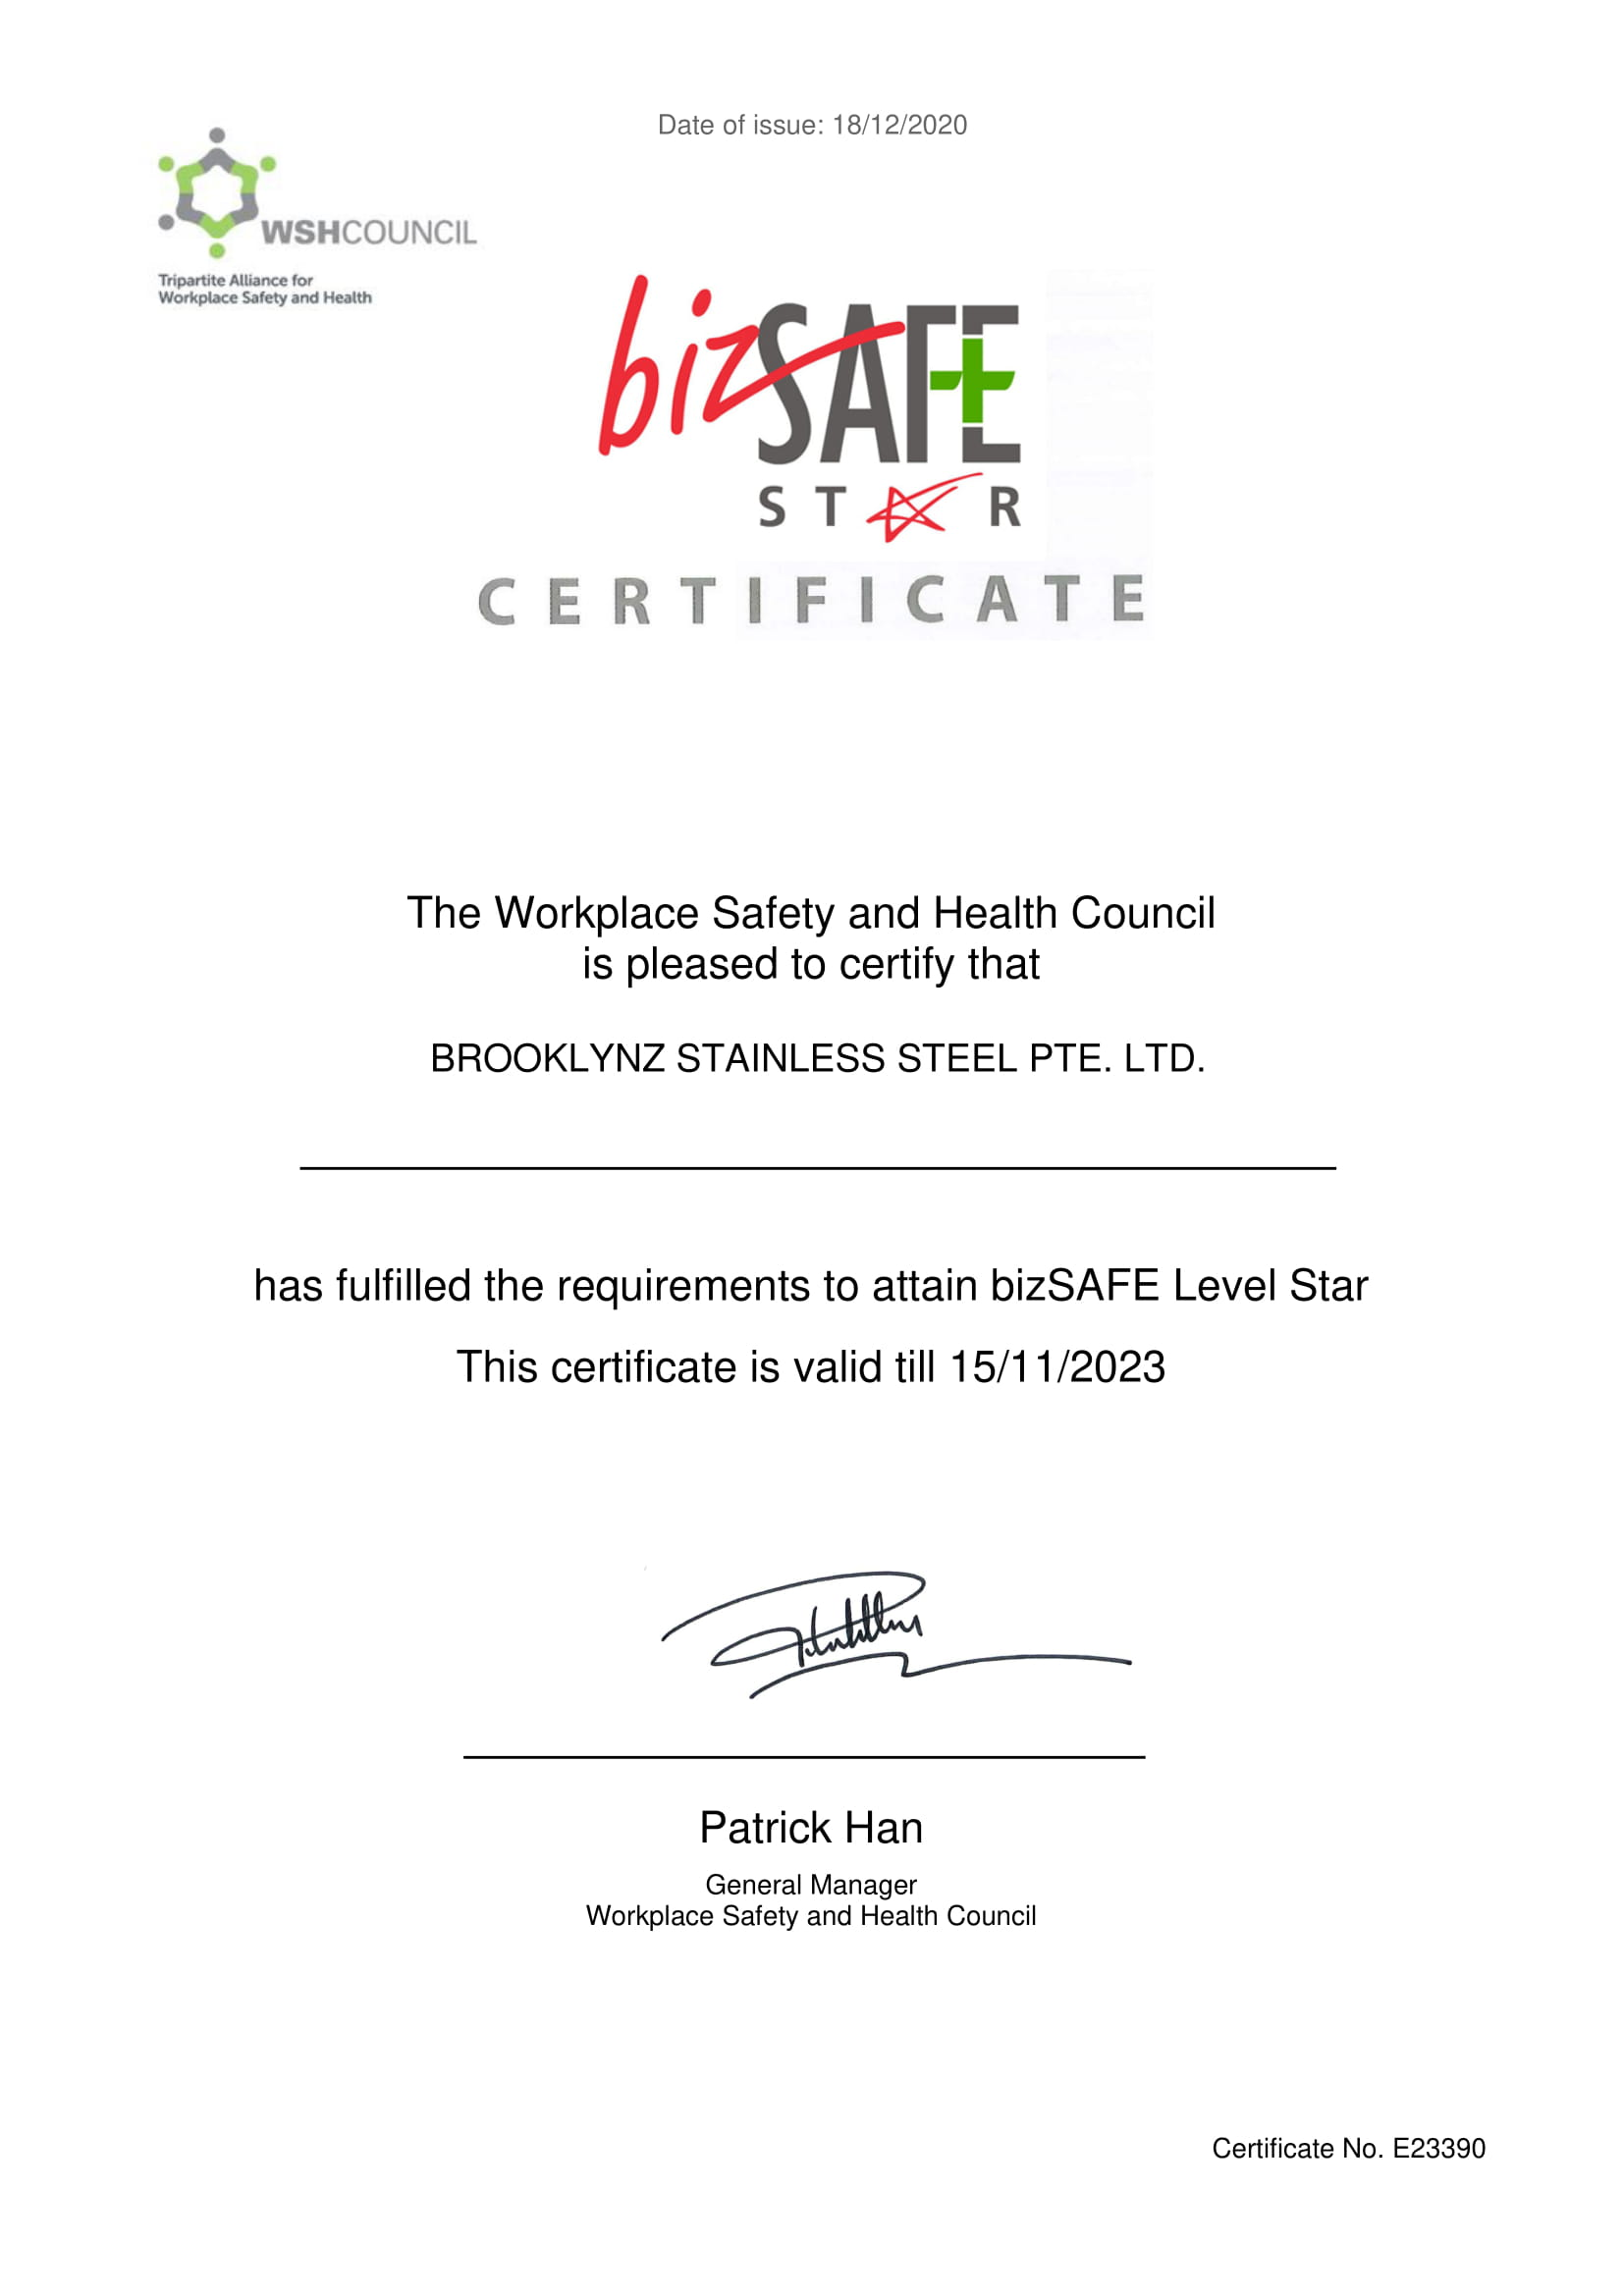 Bizsafe Certificate 15-11-2023-1